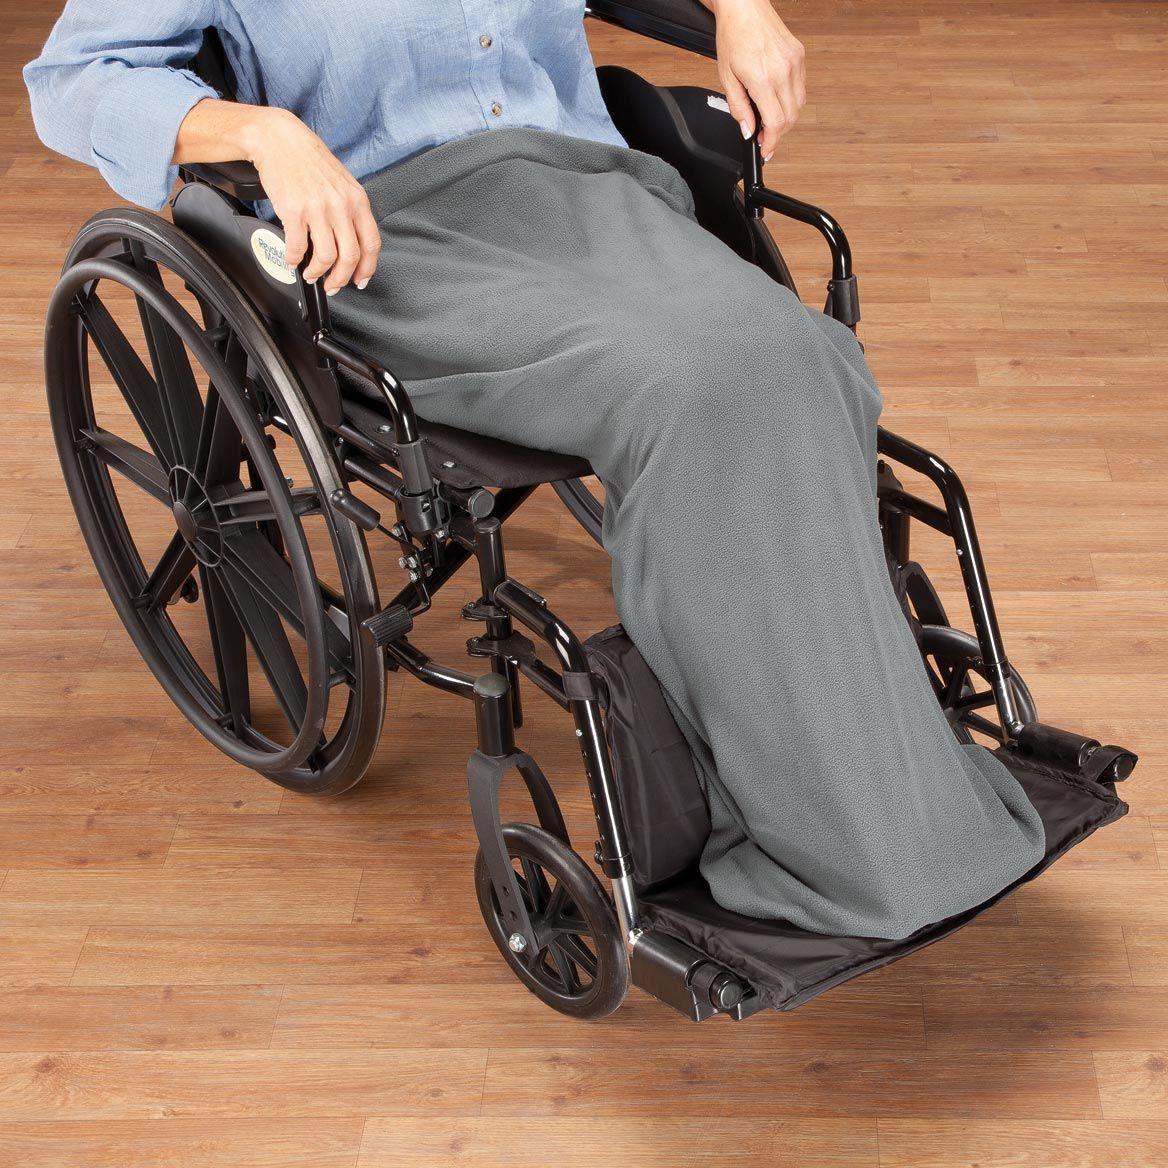 Wheelchair Drake How To Make A Wooden Chair Seat Leg Blanket Lap Throws Walter